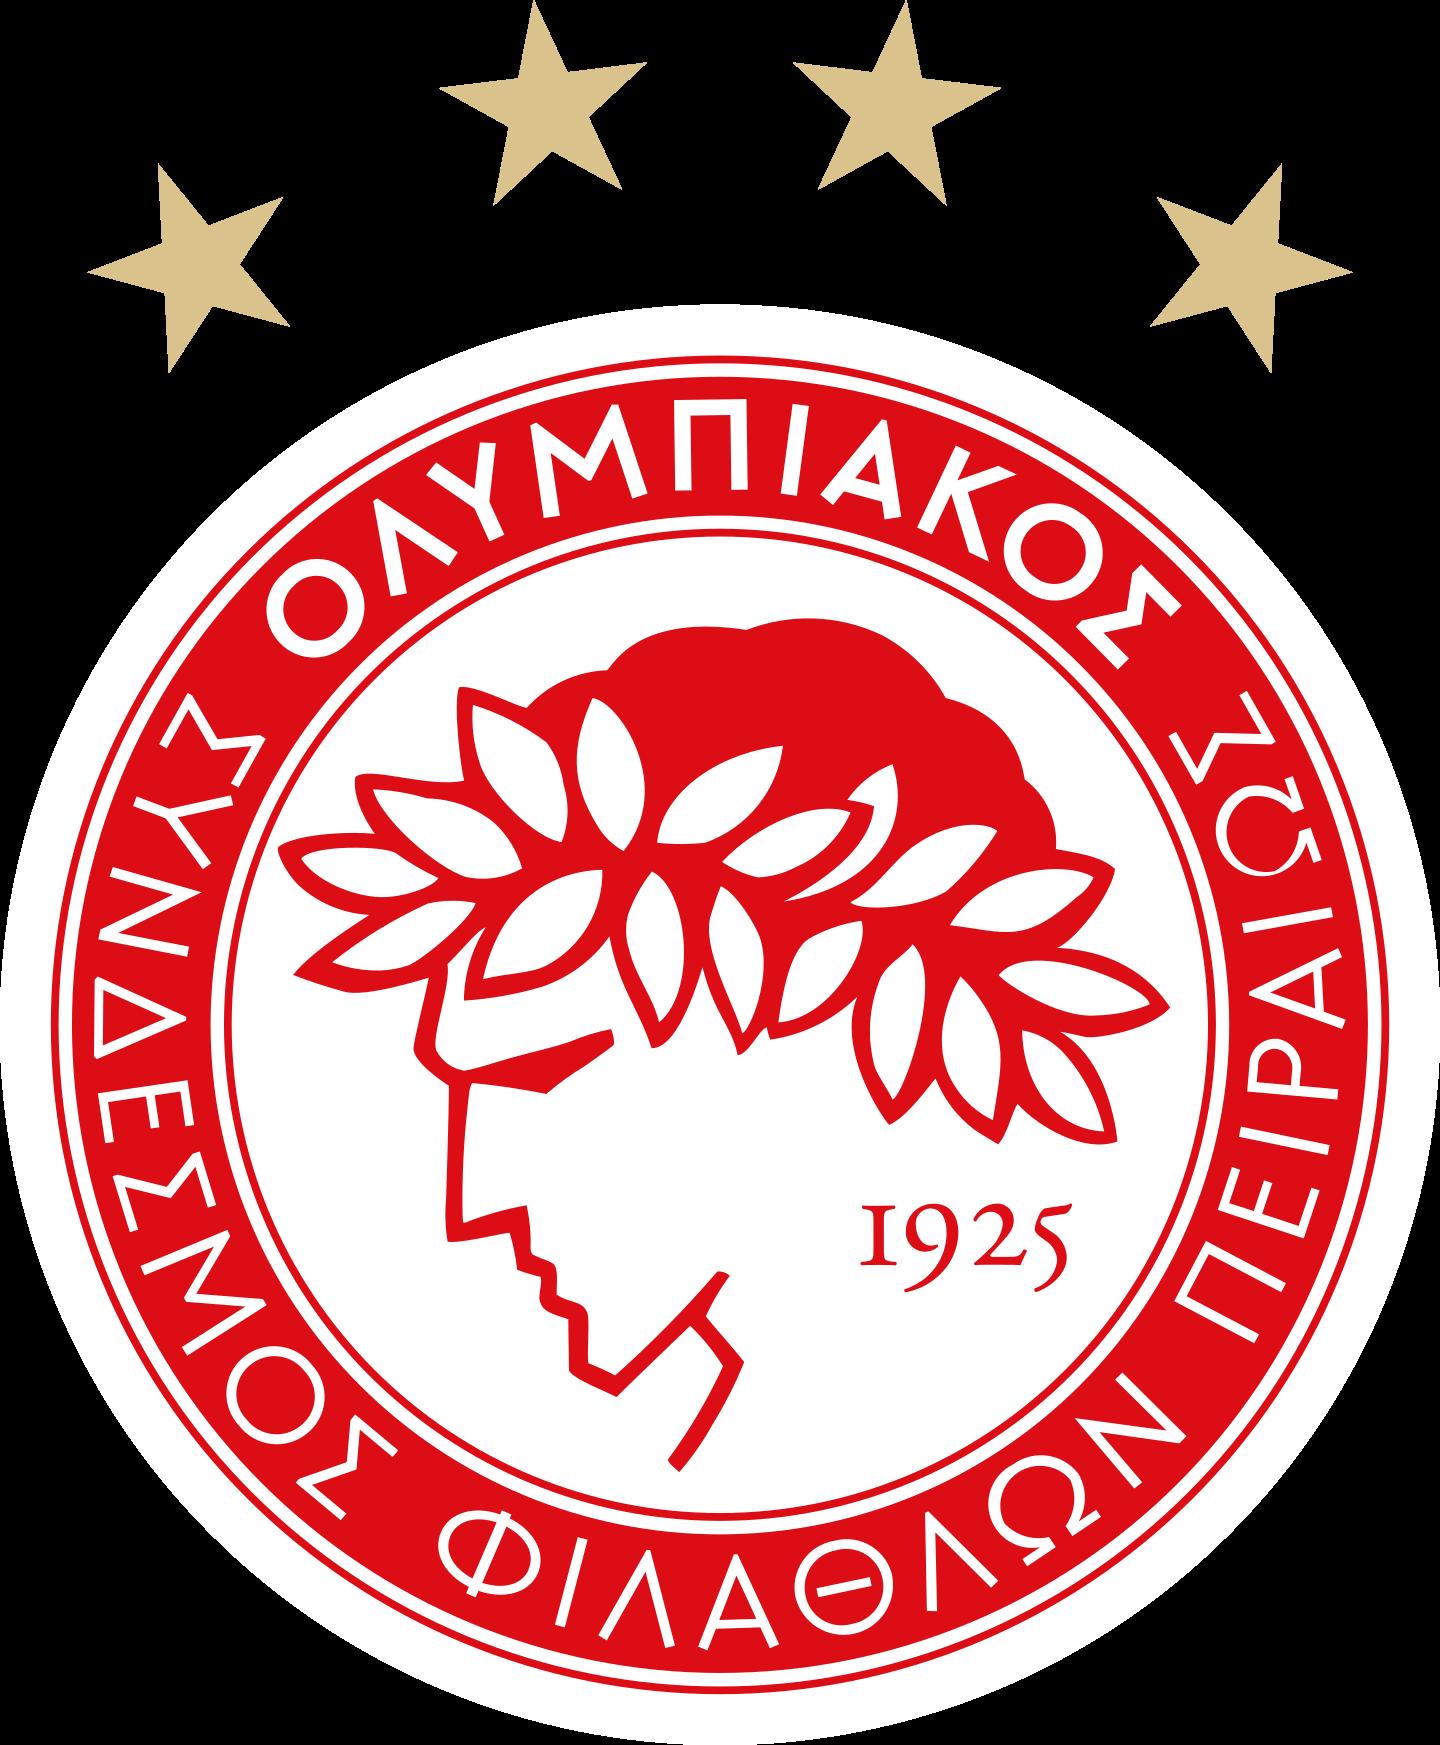 olympiacos logo 2 - Olympiacos Logo - Escudo